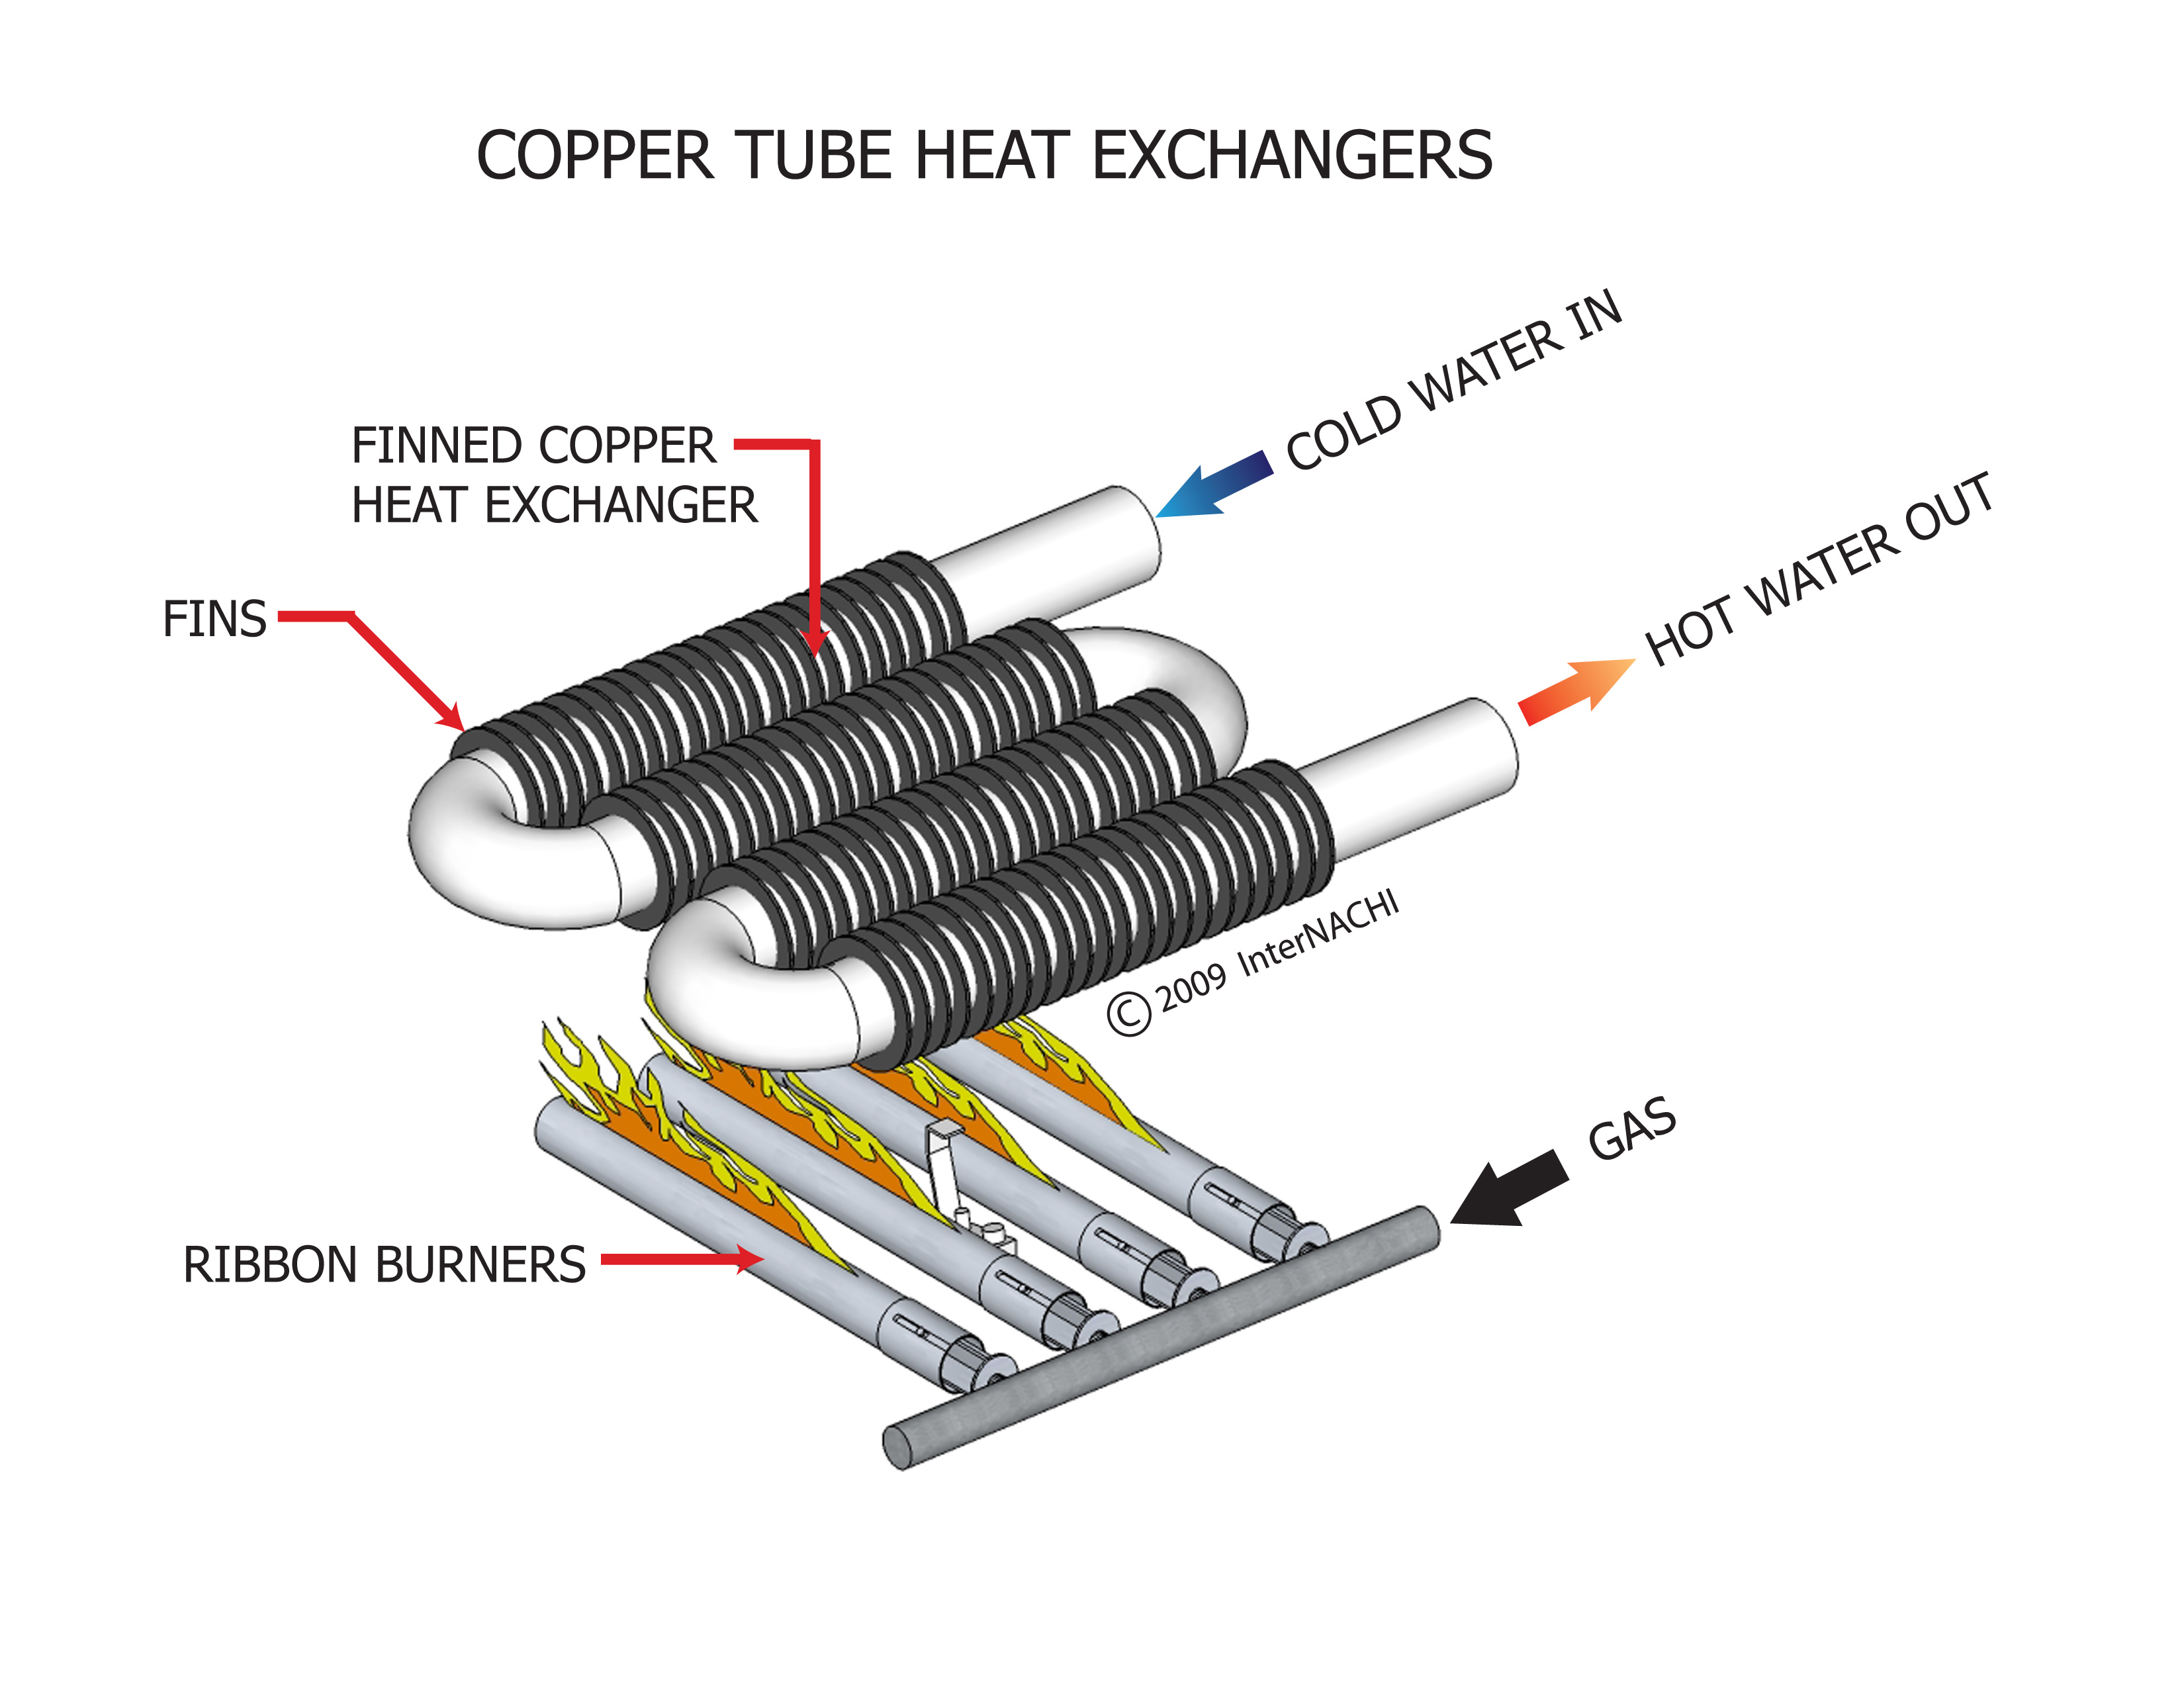 Copper tube heat exchanger.